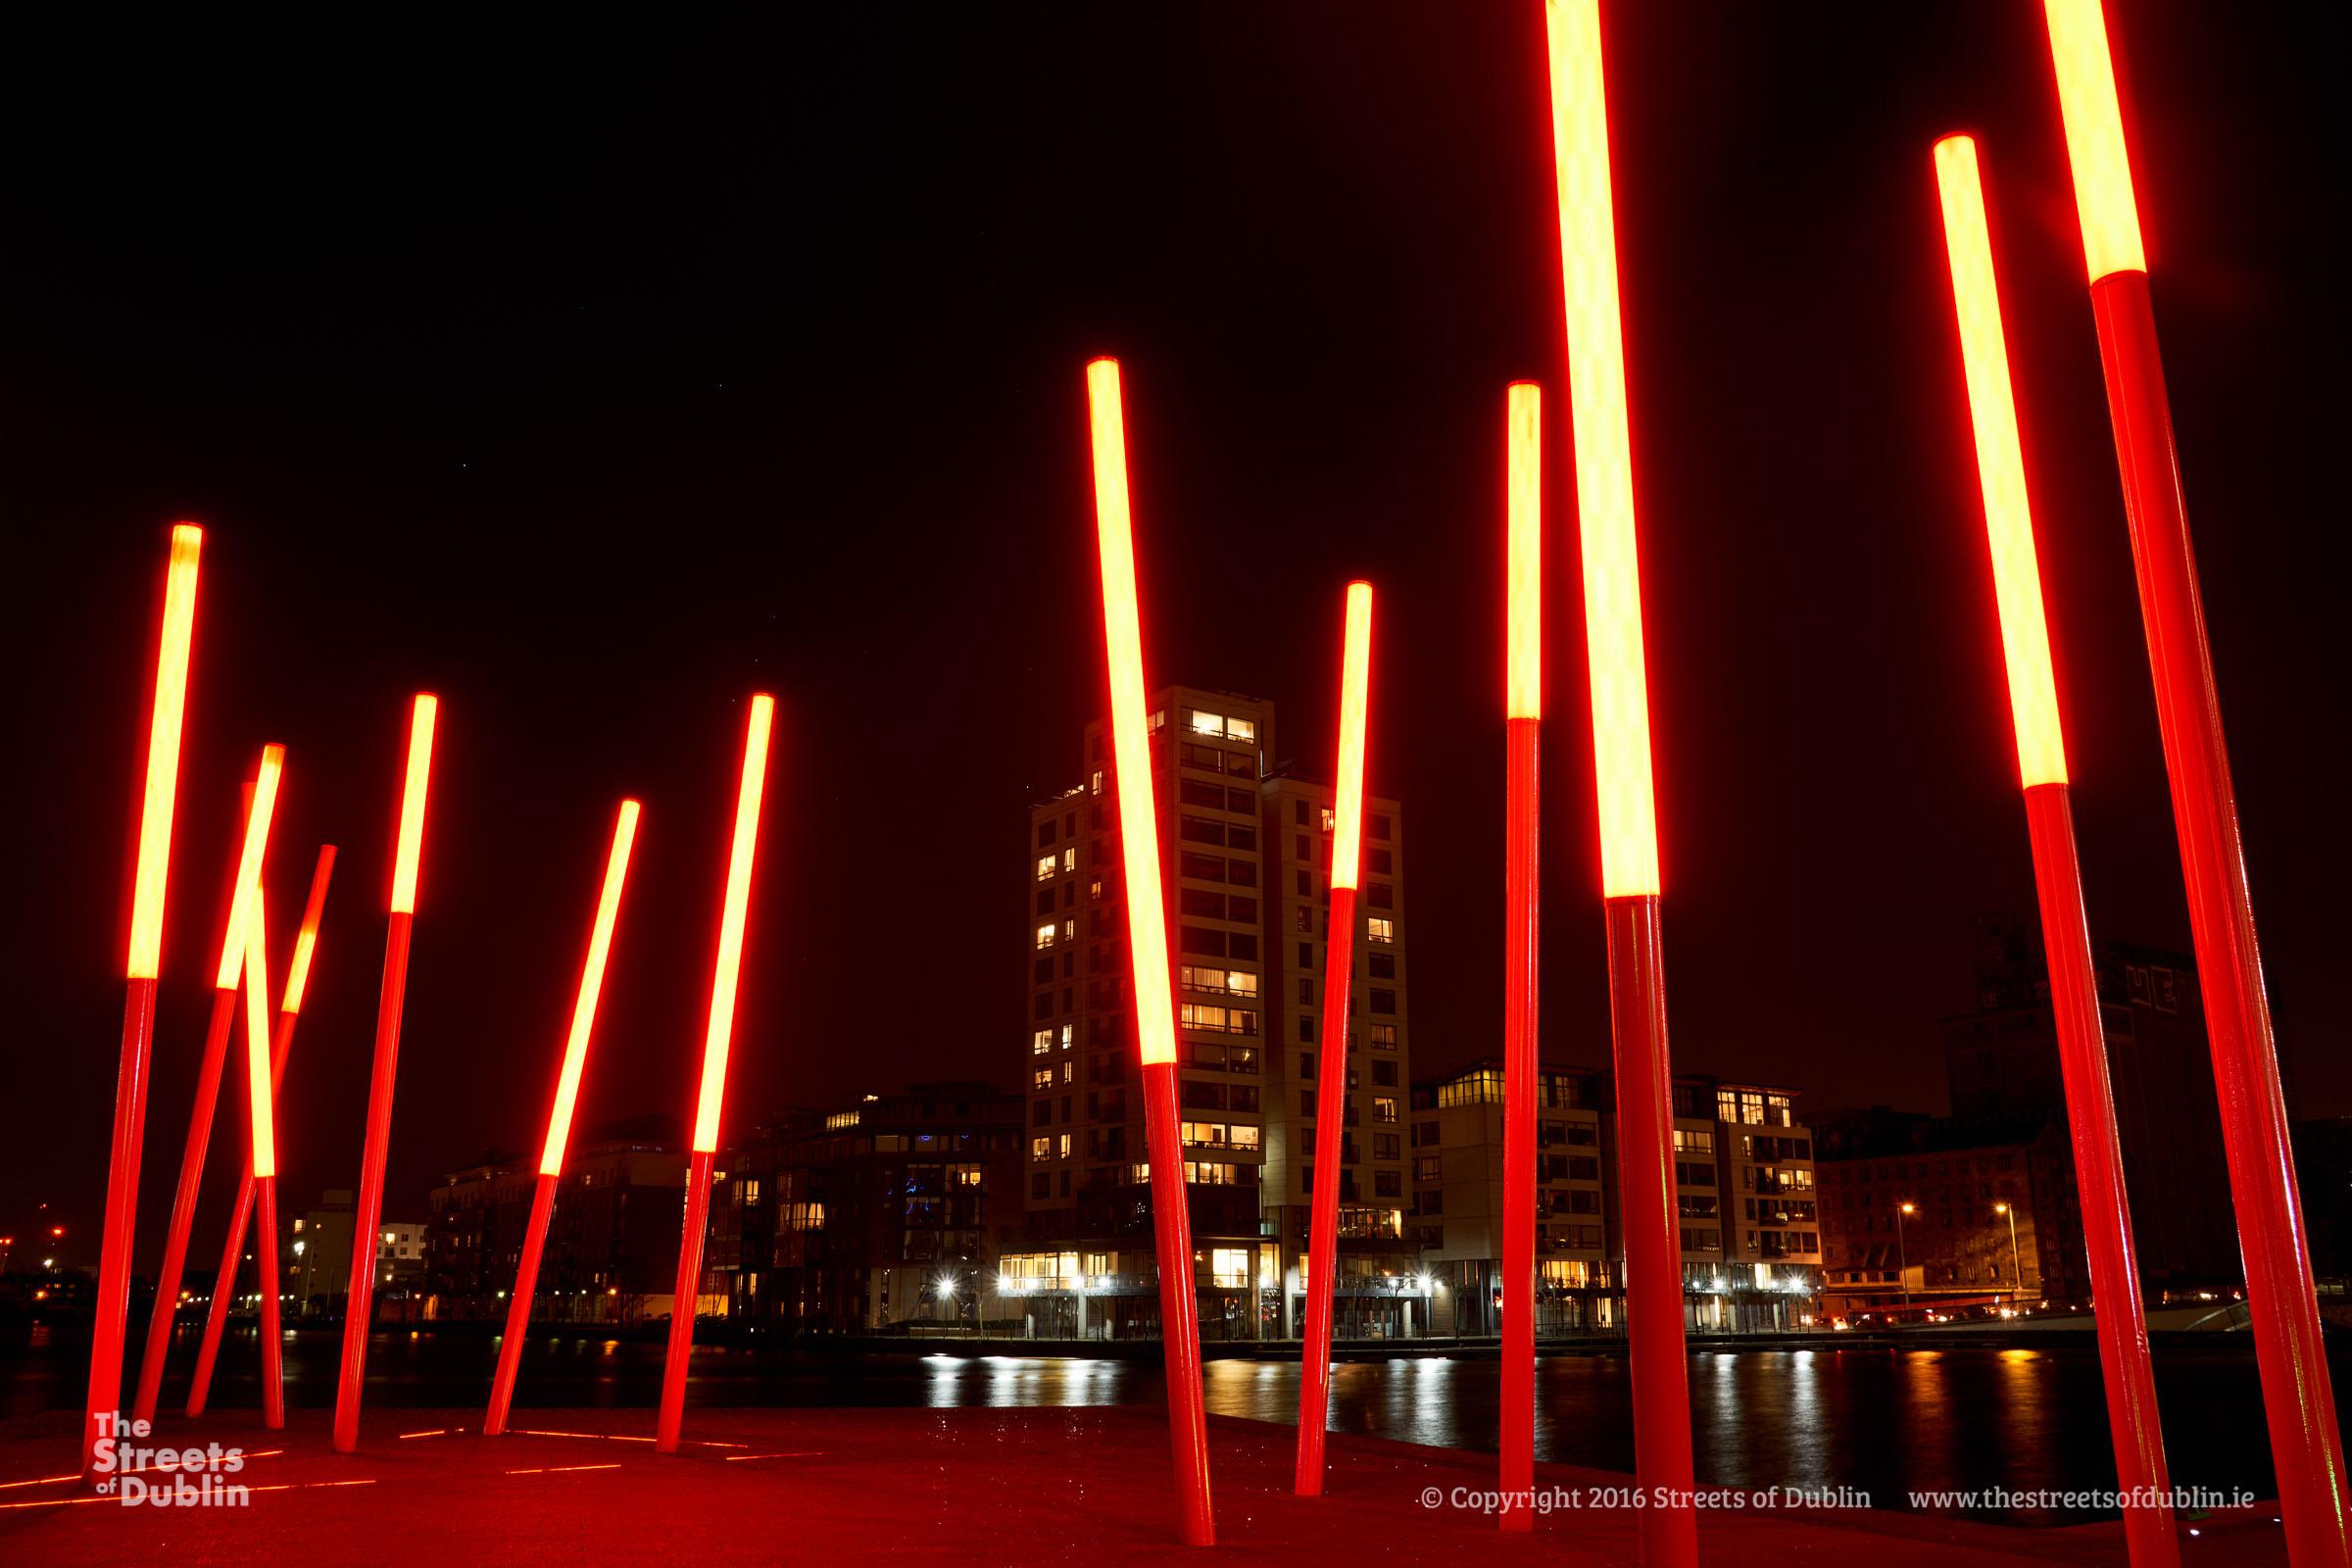 Streets-of-Dublin-Photo-10.jpg